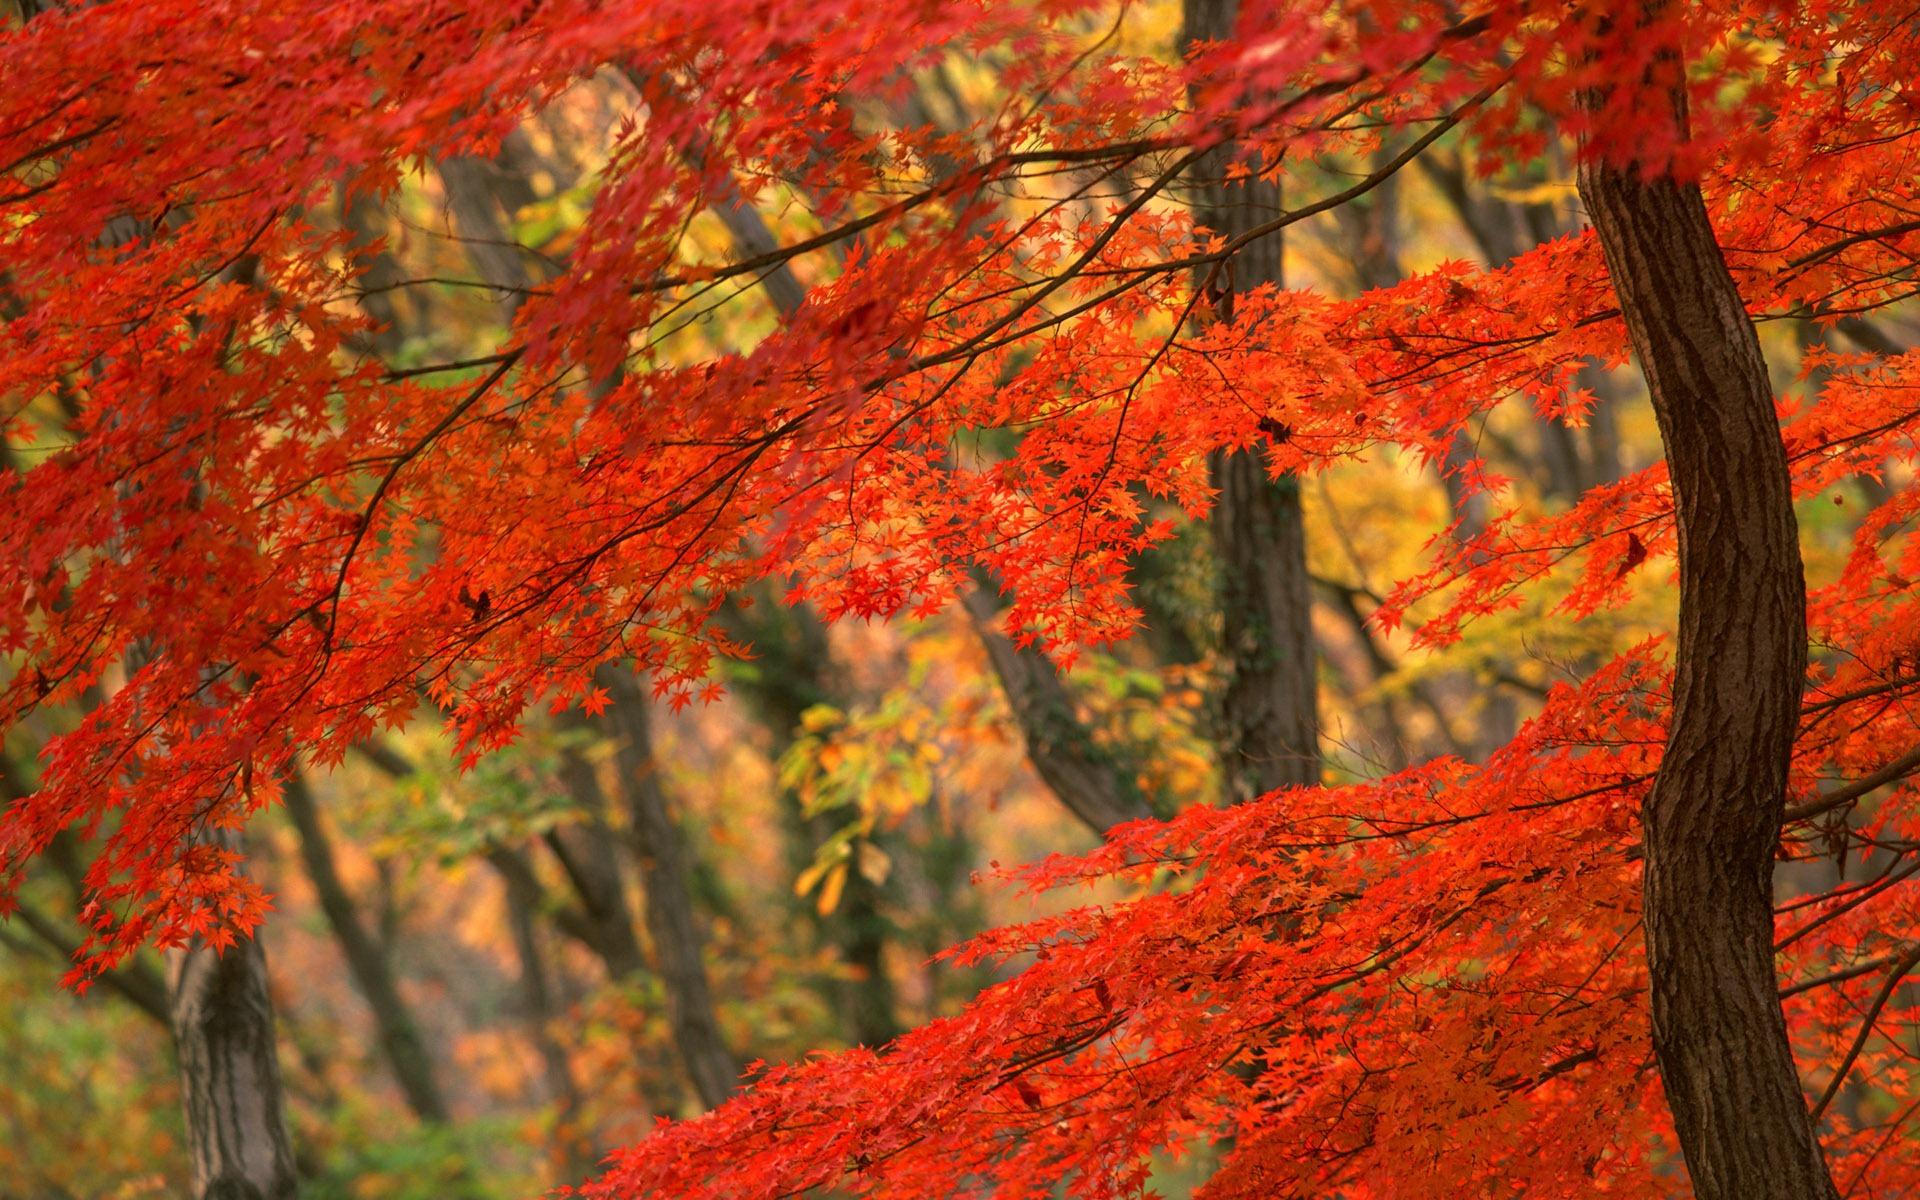 autumn-leaf-drawing-wallpaper-4.jpg